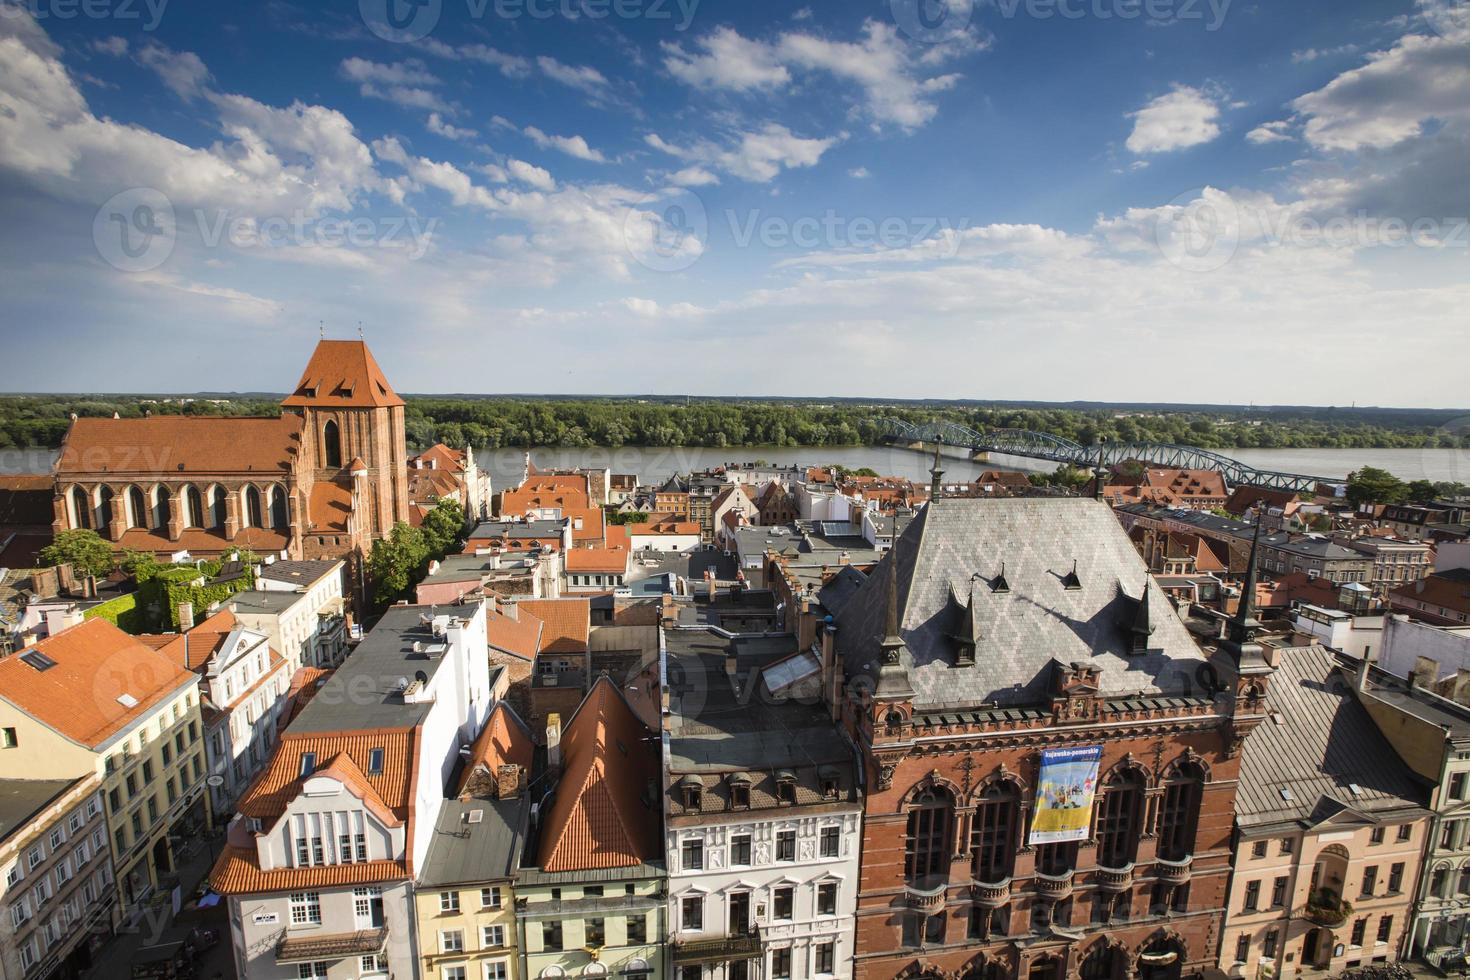 Poland - Torun, city divided by Vistula river between Pomerania photo